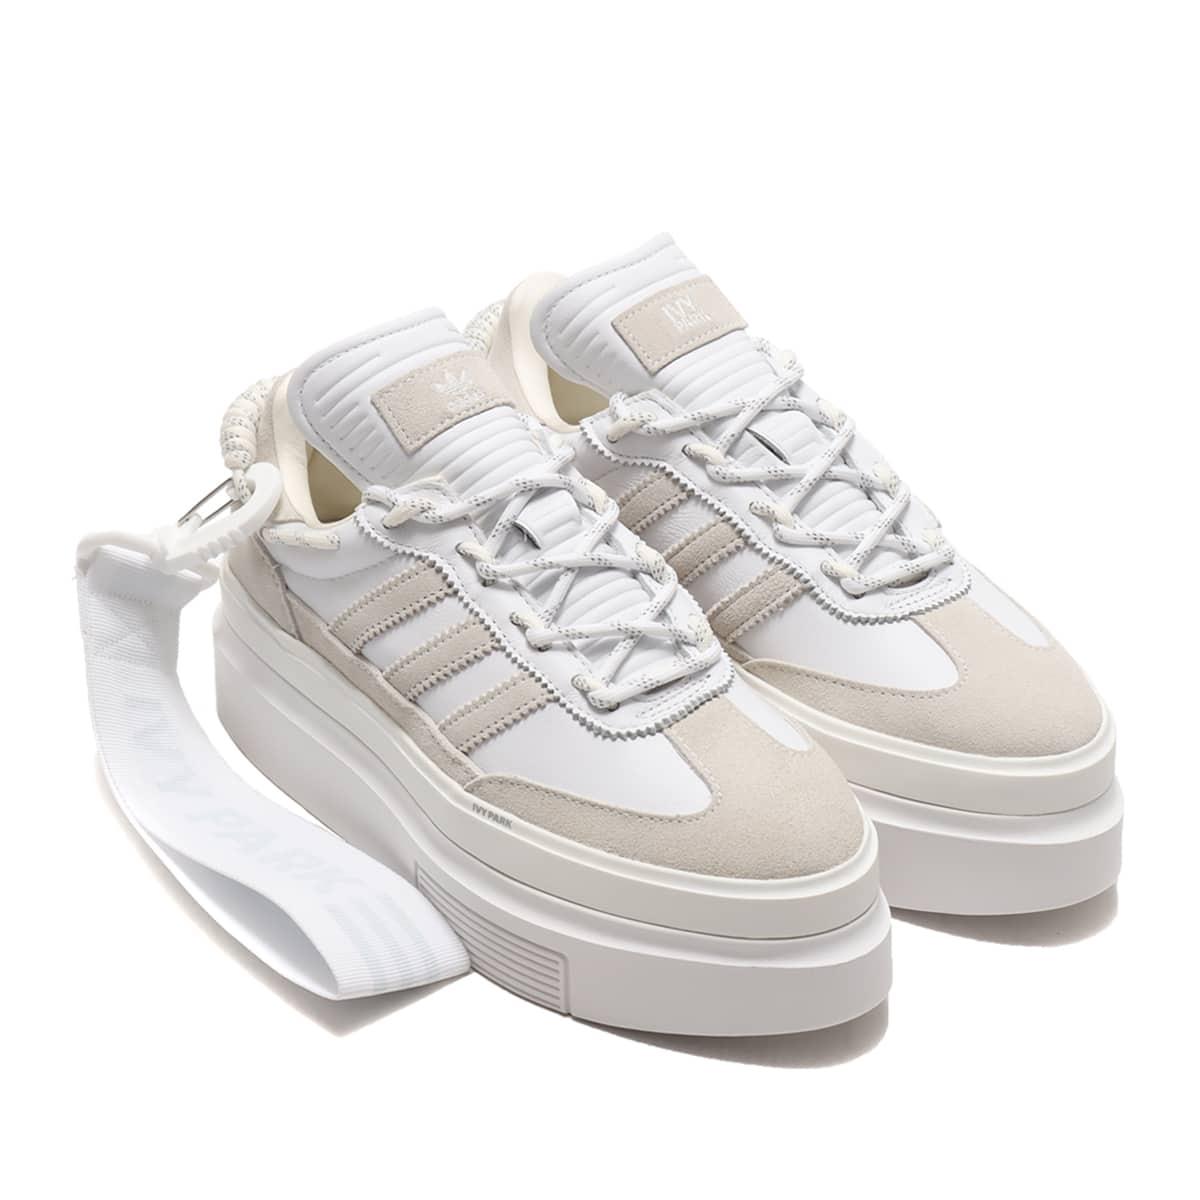 adidas IVP Super Super Sleek 72 FOOTWEAR WHITE/OFF WHITE/CORE WHITE 21SS-S_photo_large